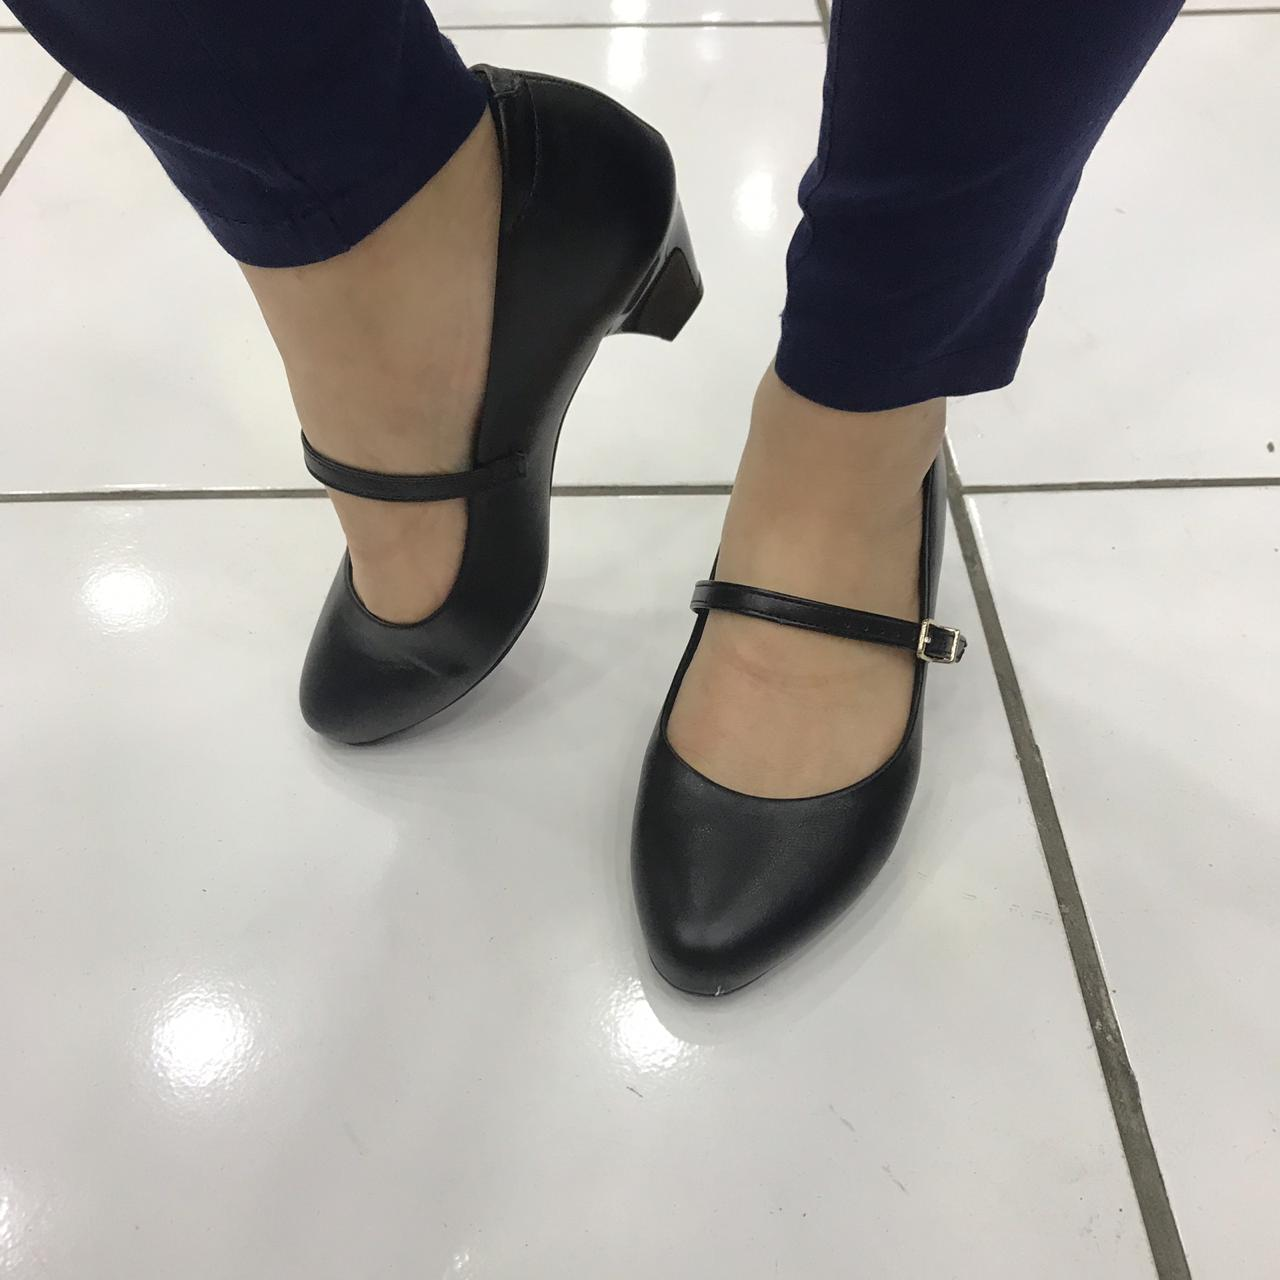 Sapato Boneca Modare Salto Grosso Baixo De Uniforme 7005.641 Feminino Preto